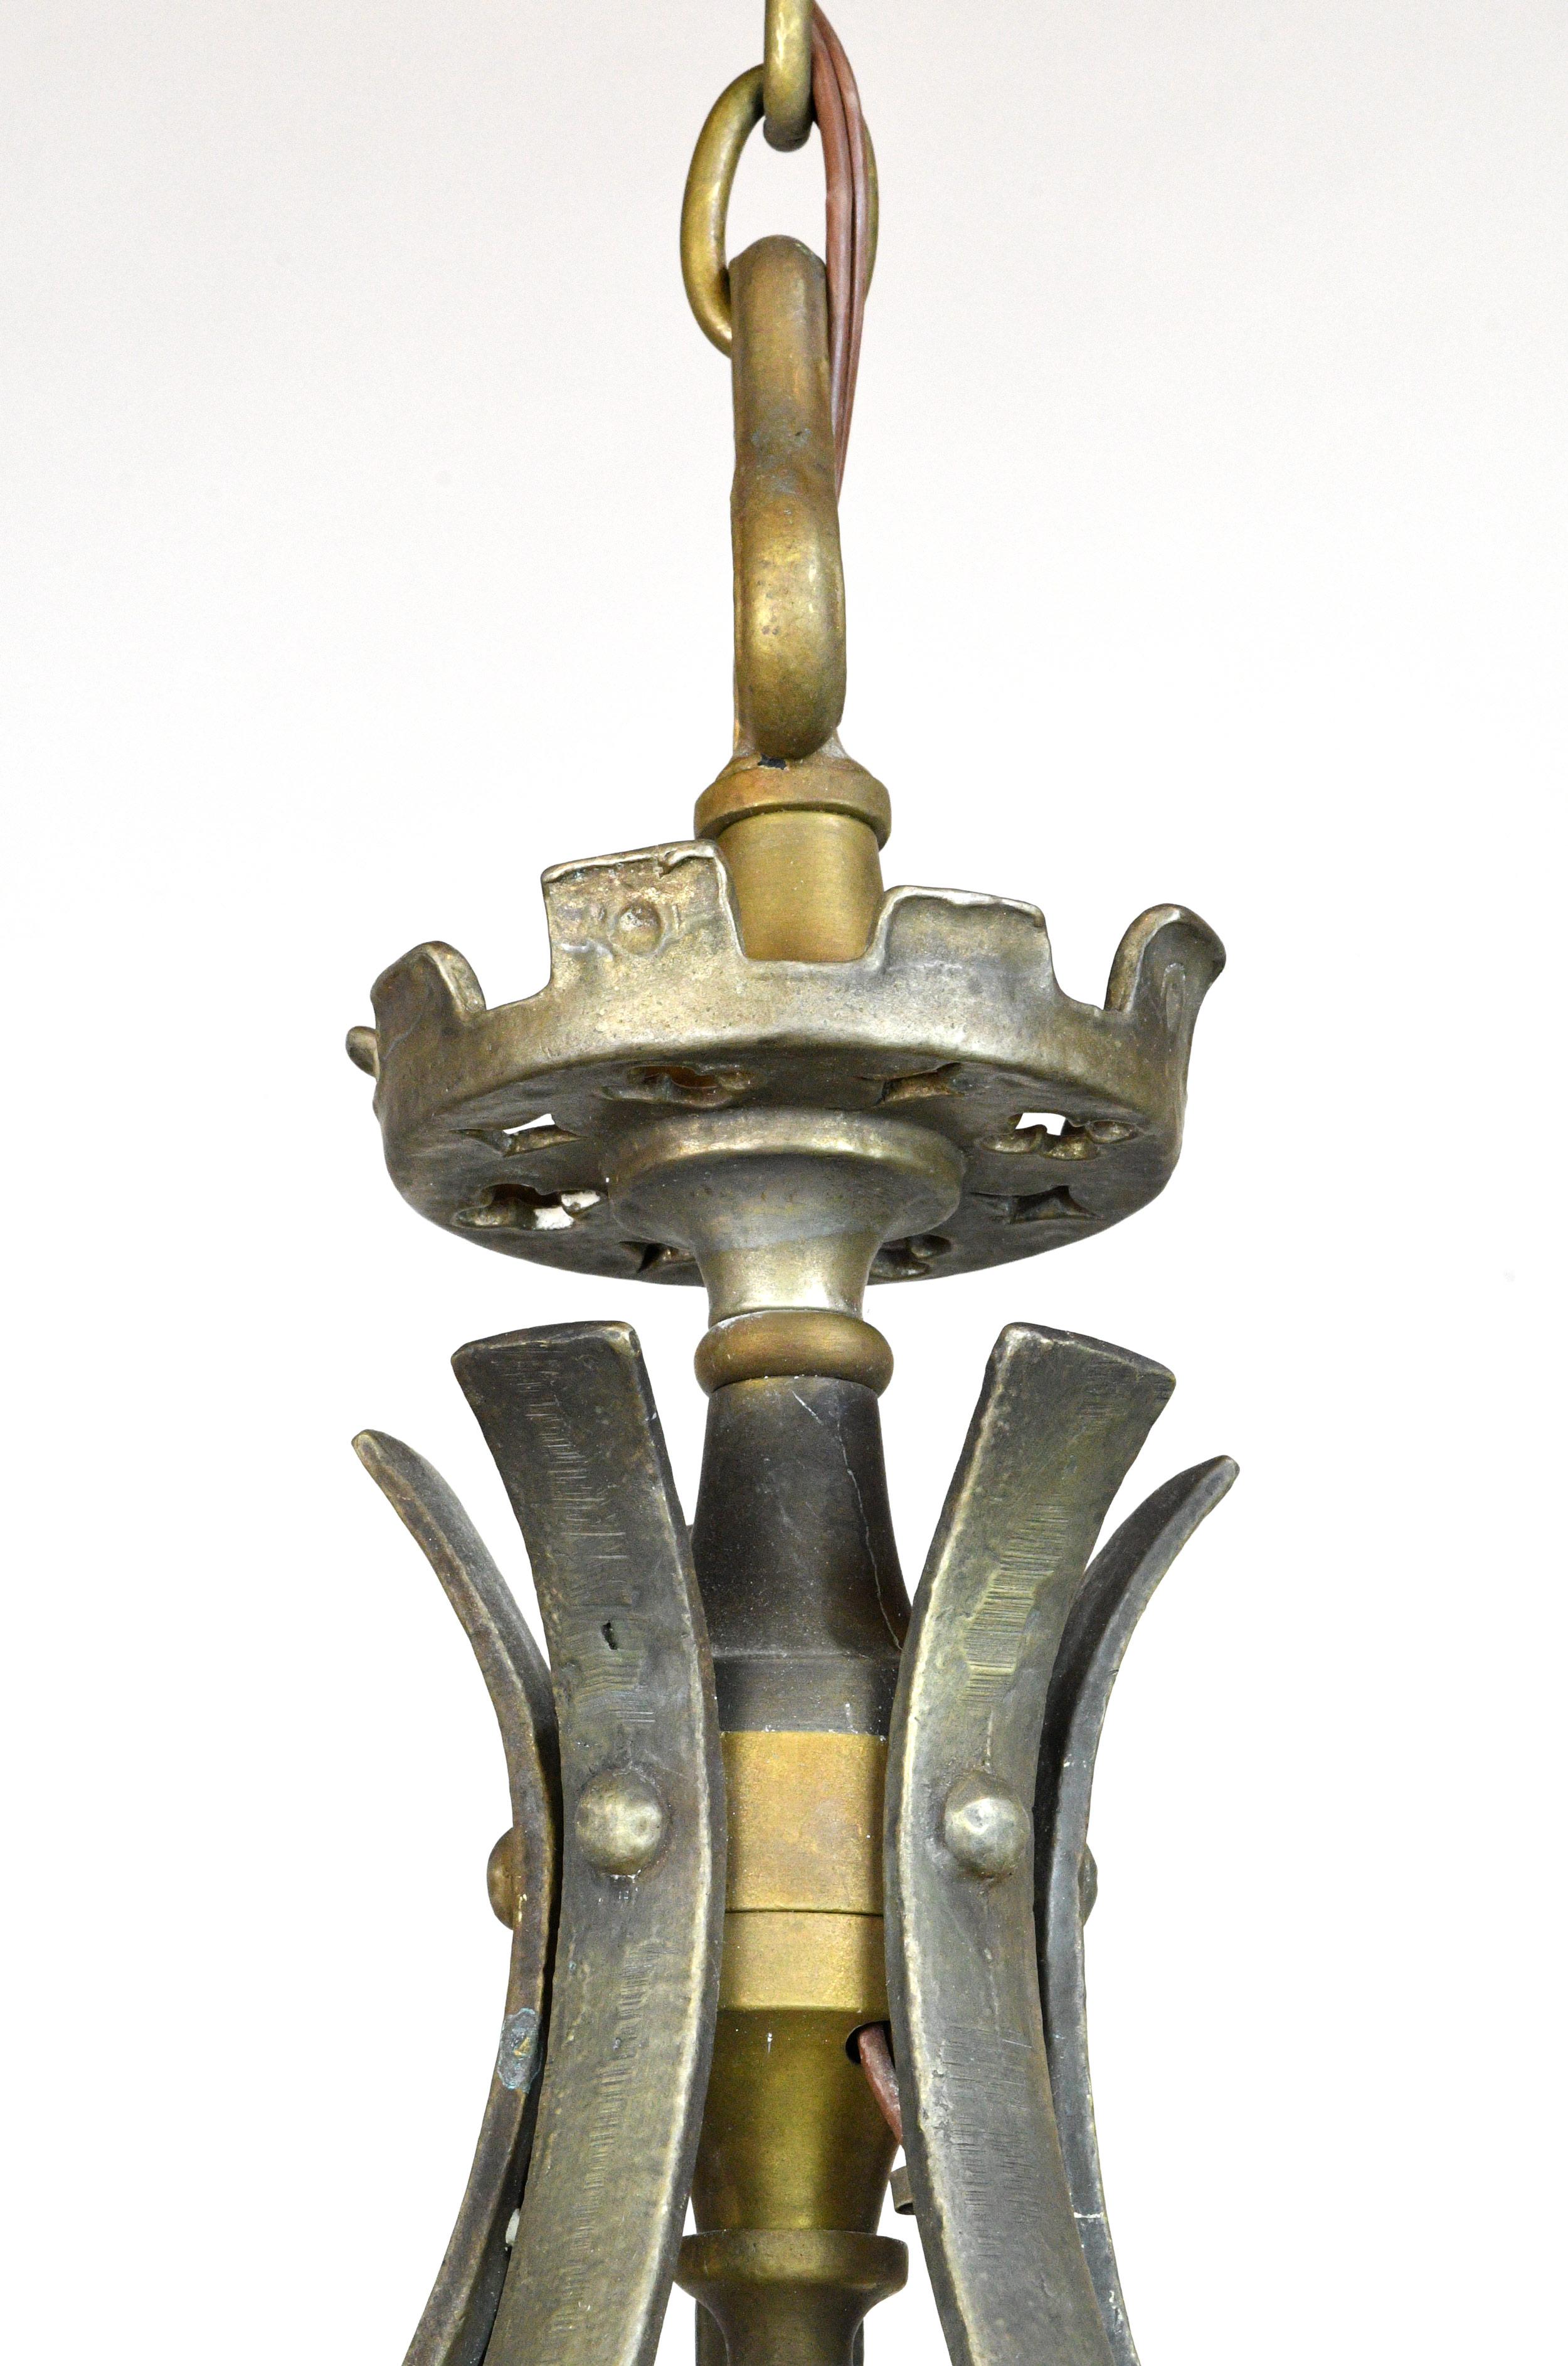 47616-bronze-tudor-5-candle-chandelier-chain.jpg